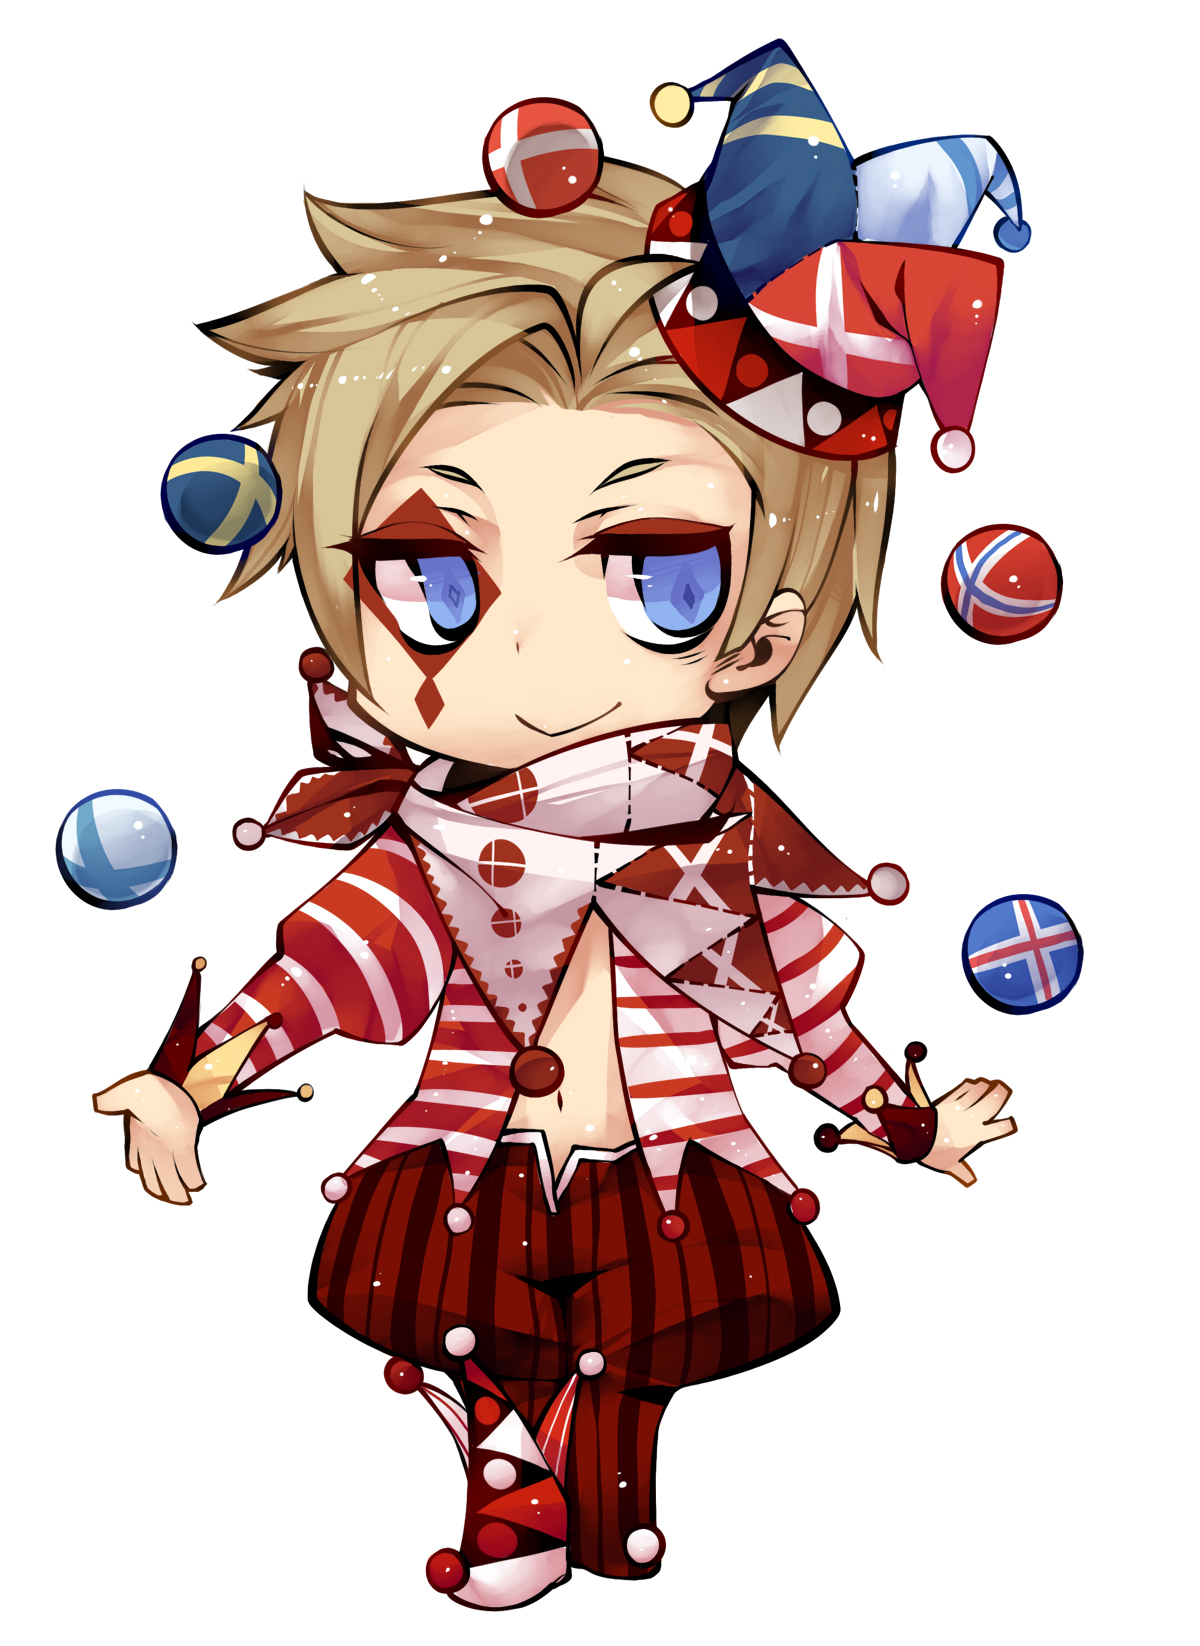 Clown Chibi Zerochan Anime Board